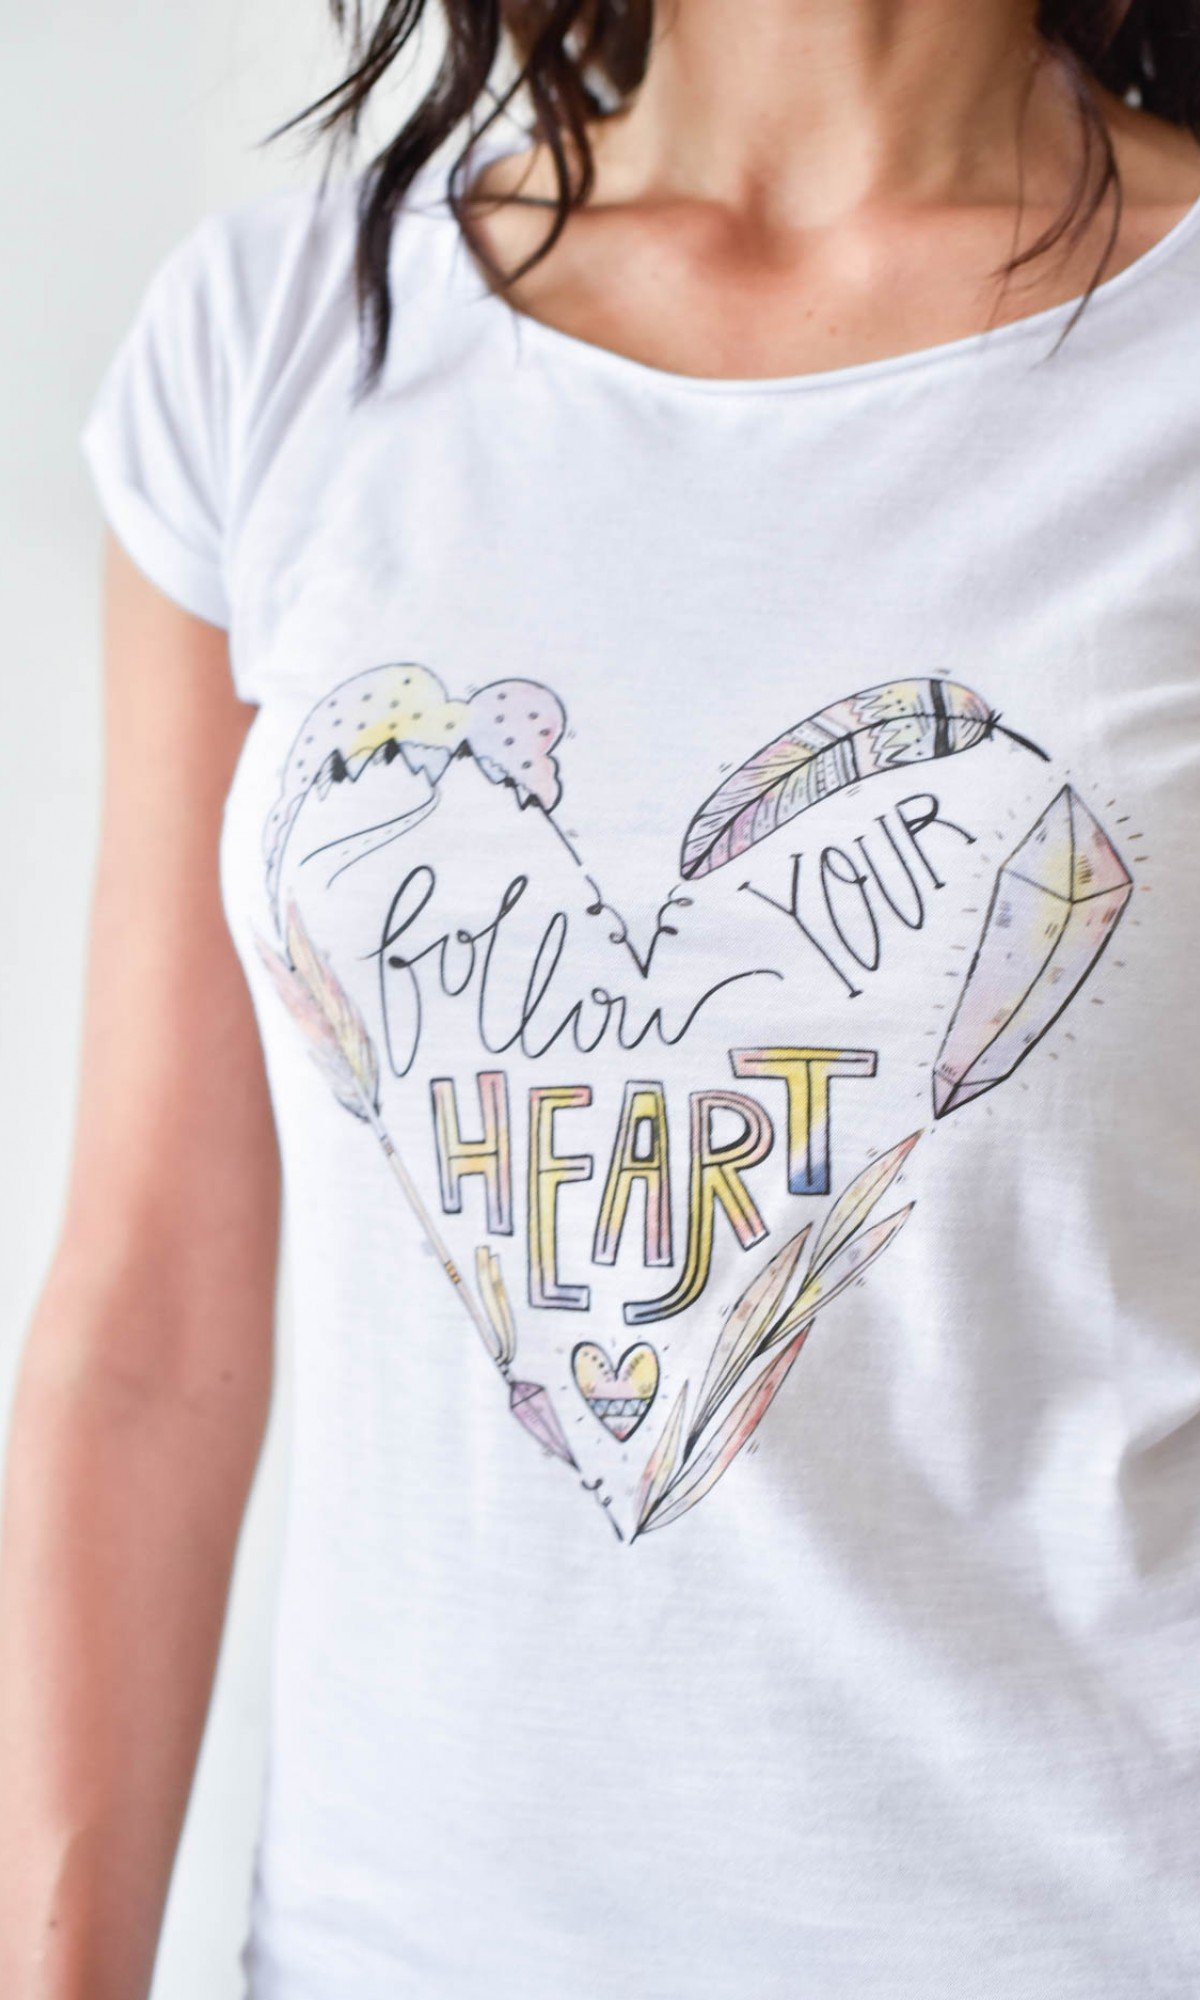 White Cotton Follow Your Heart Print T-shirt A90251